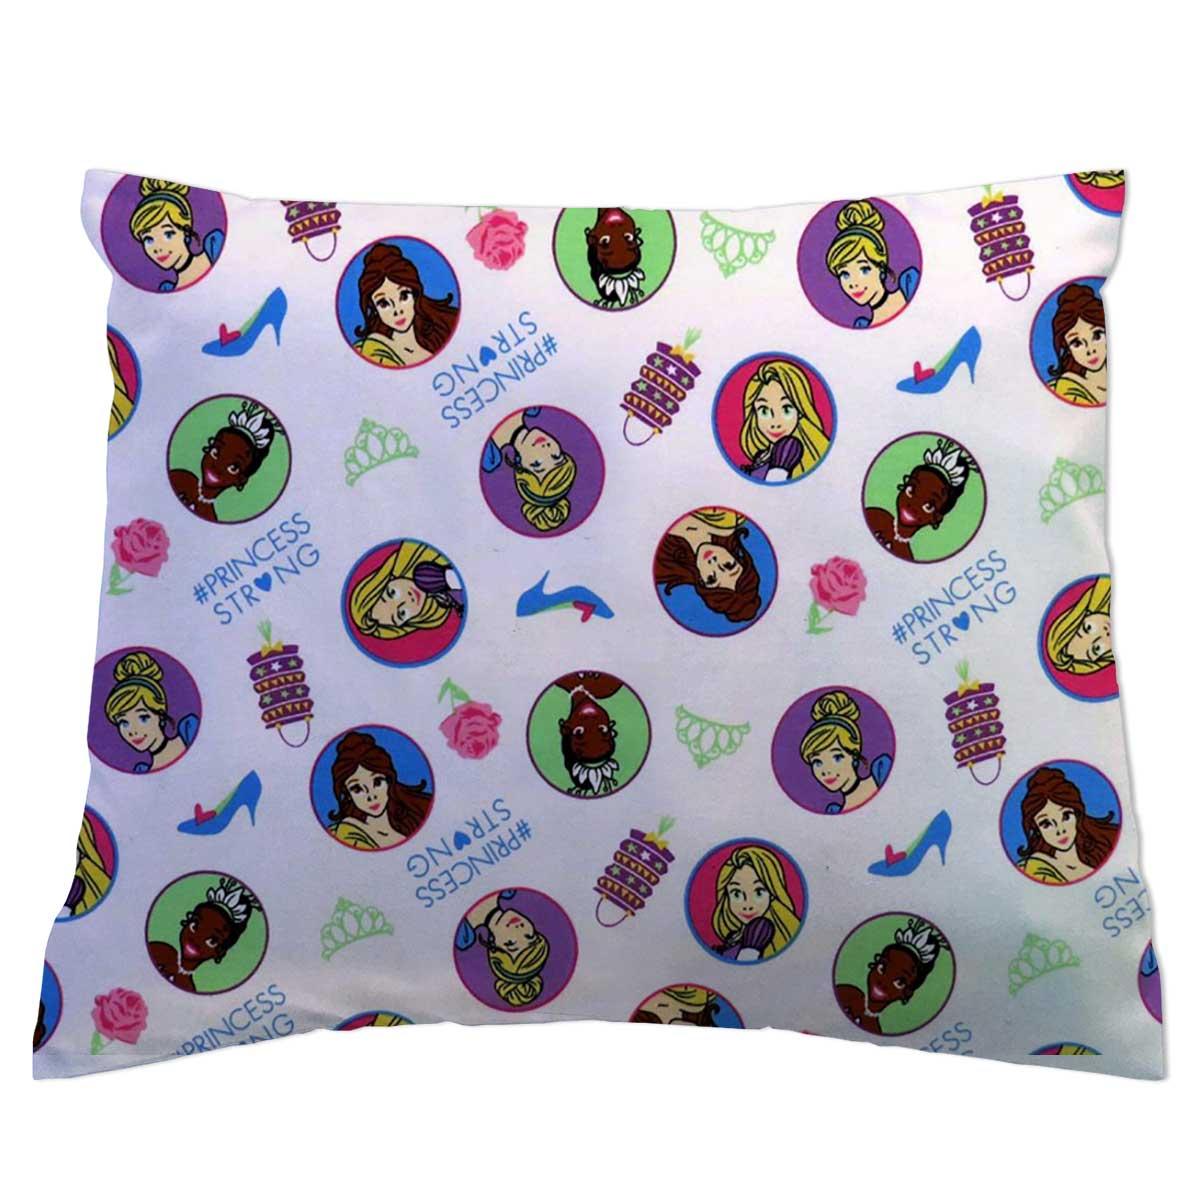 Twin Pillow Case Princess Strong Twin Pillow Cases Sheetworld